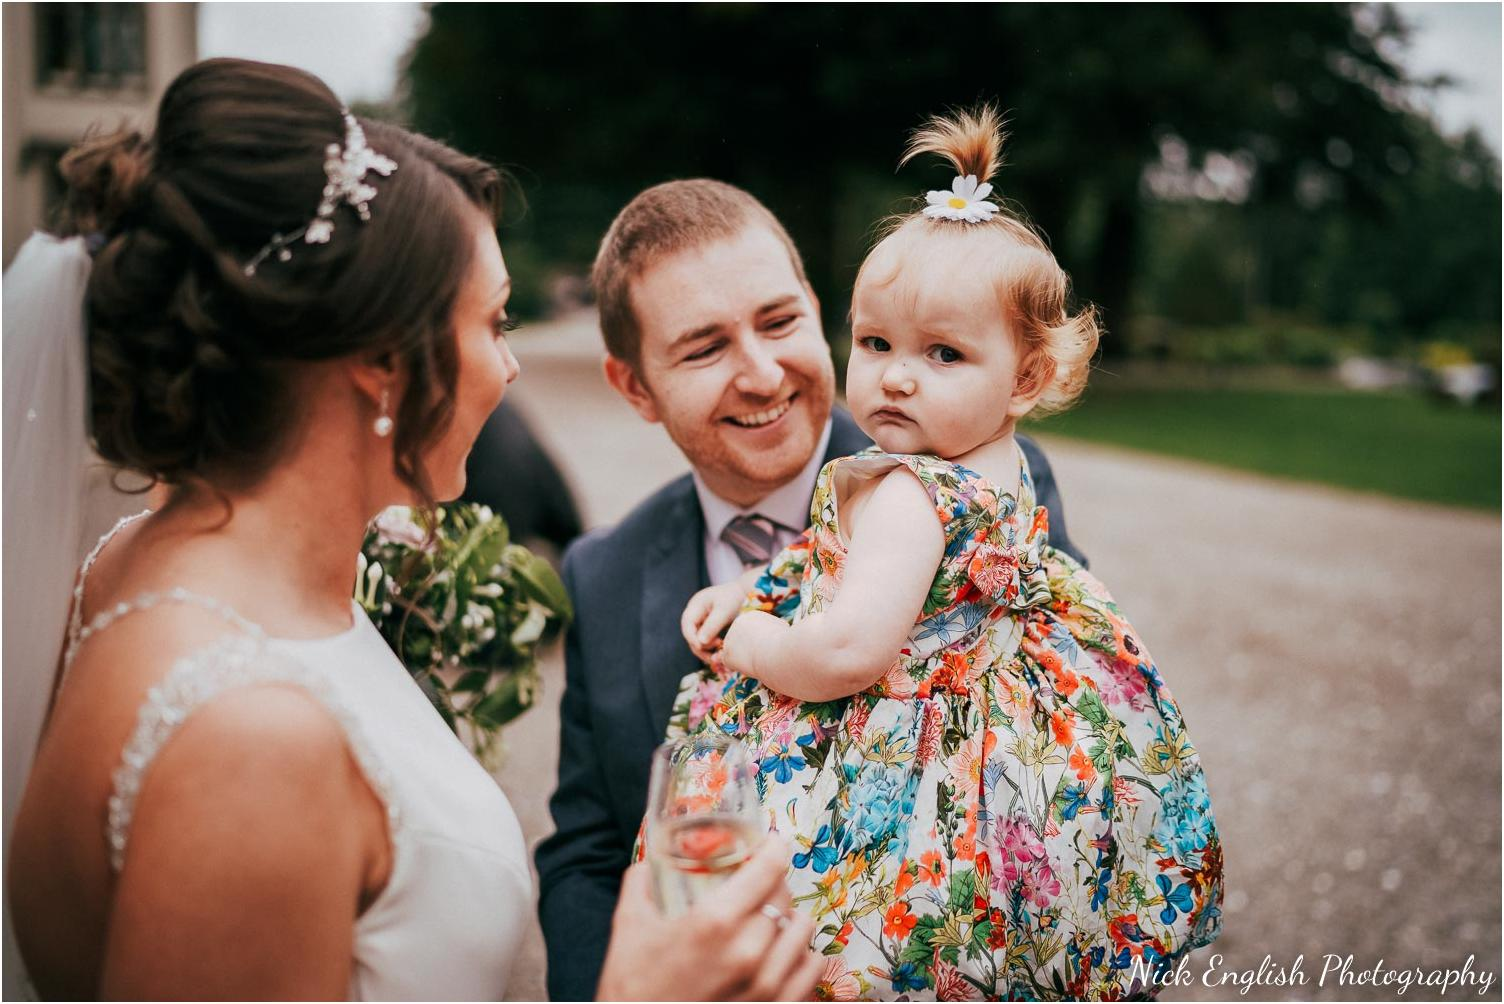 Mitton_Hall_Wedding_Summer_Photograph-69.jpg